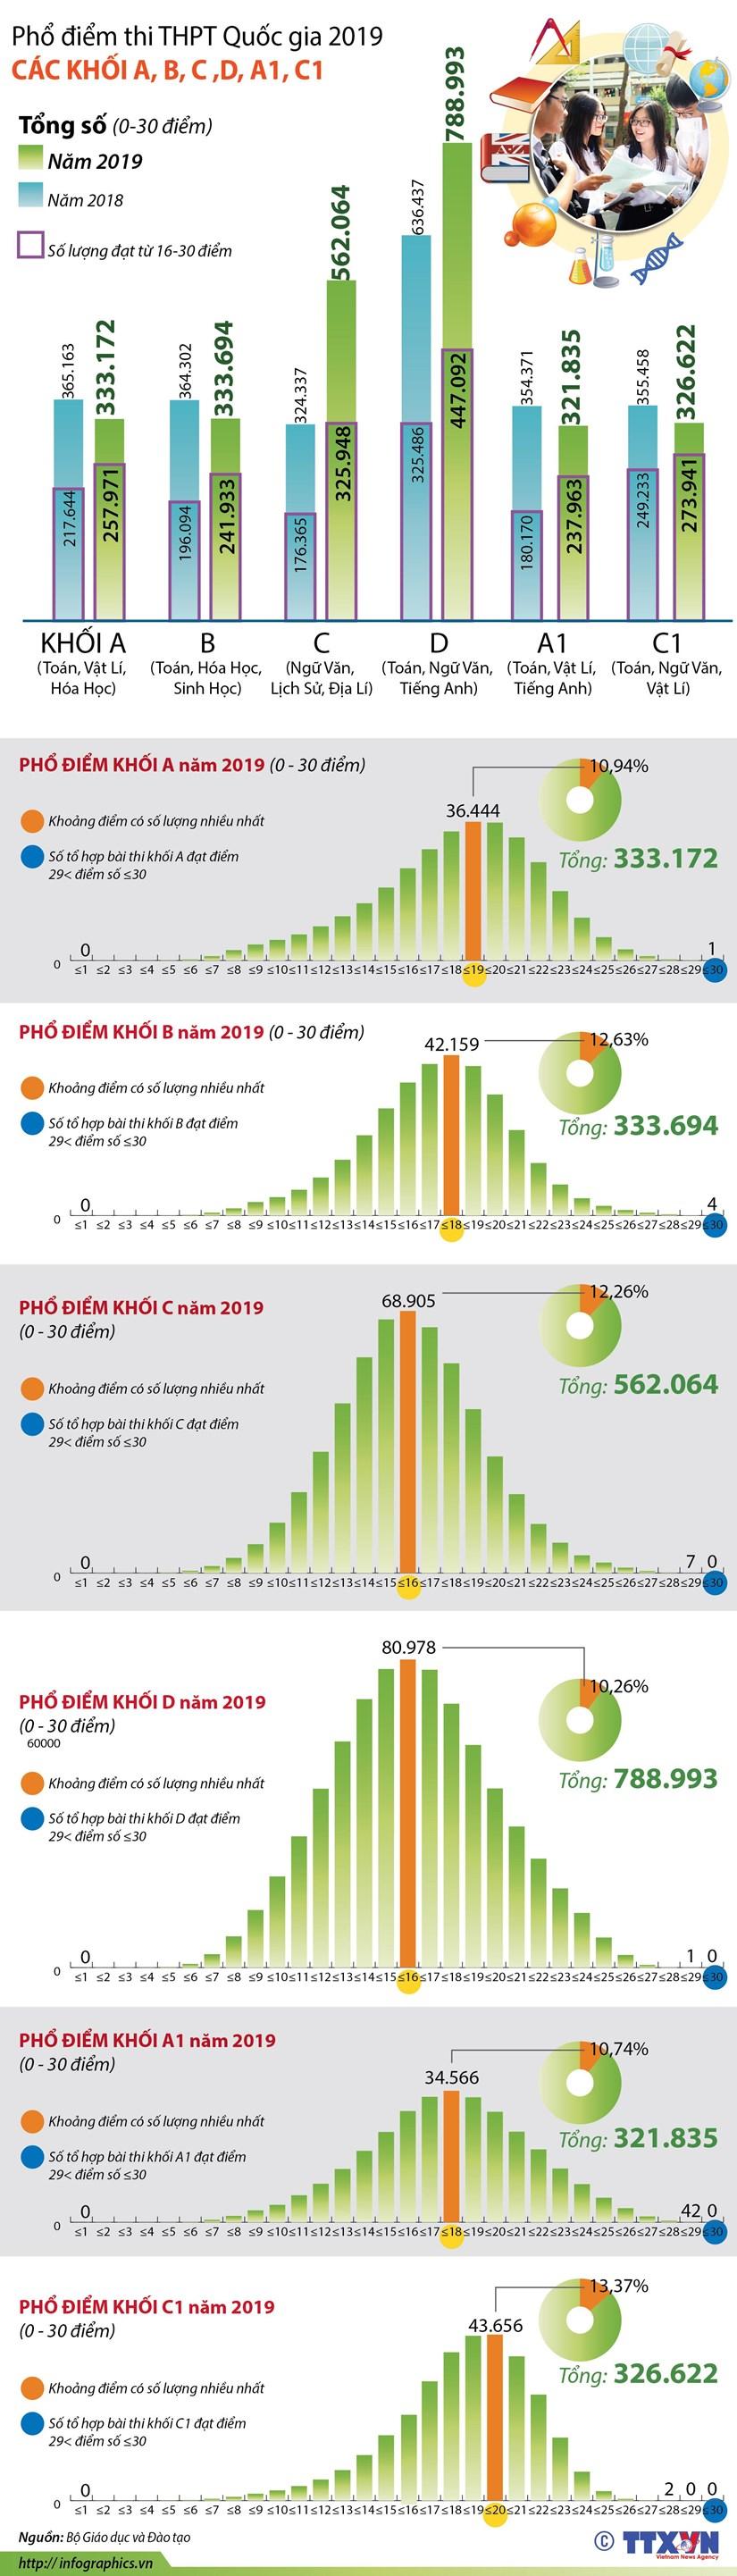 [Infographics] Pho diem mot so khoi thi truyen thong nam 2019 hinh anh 1